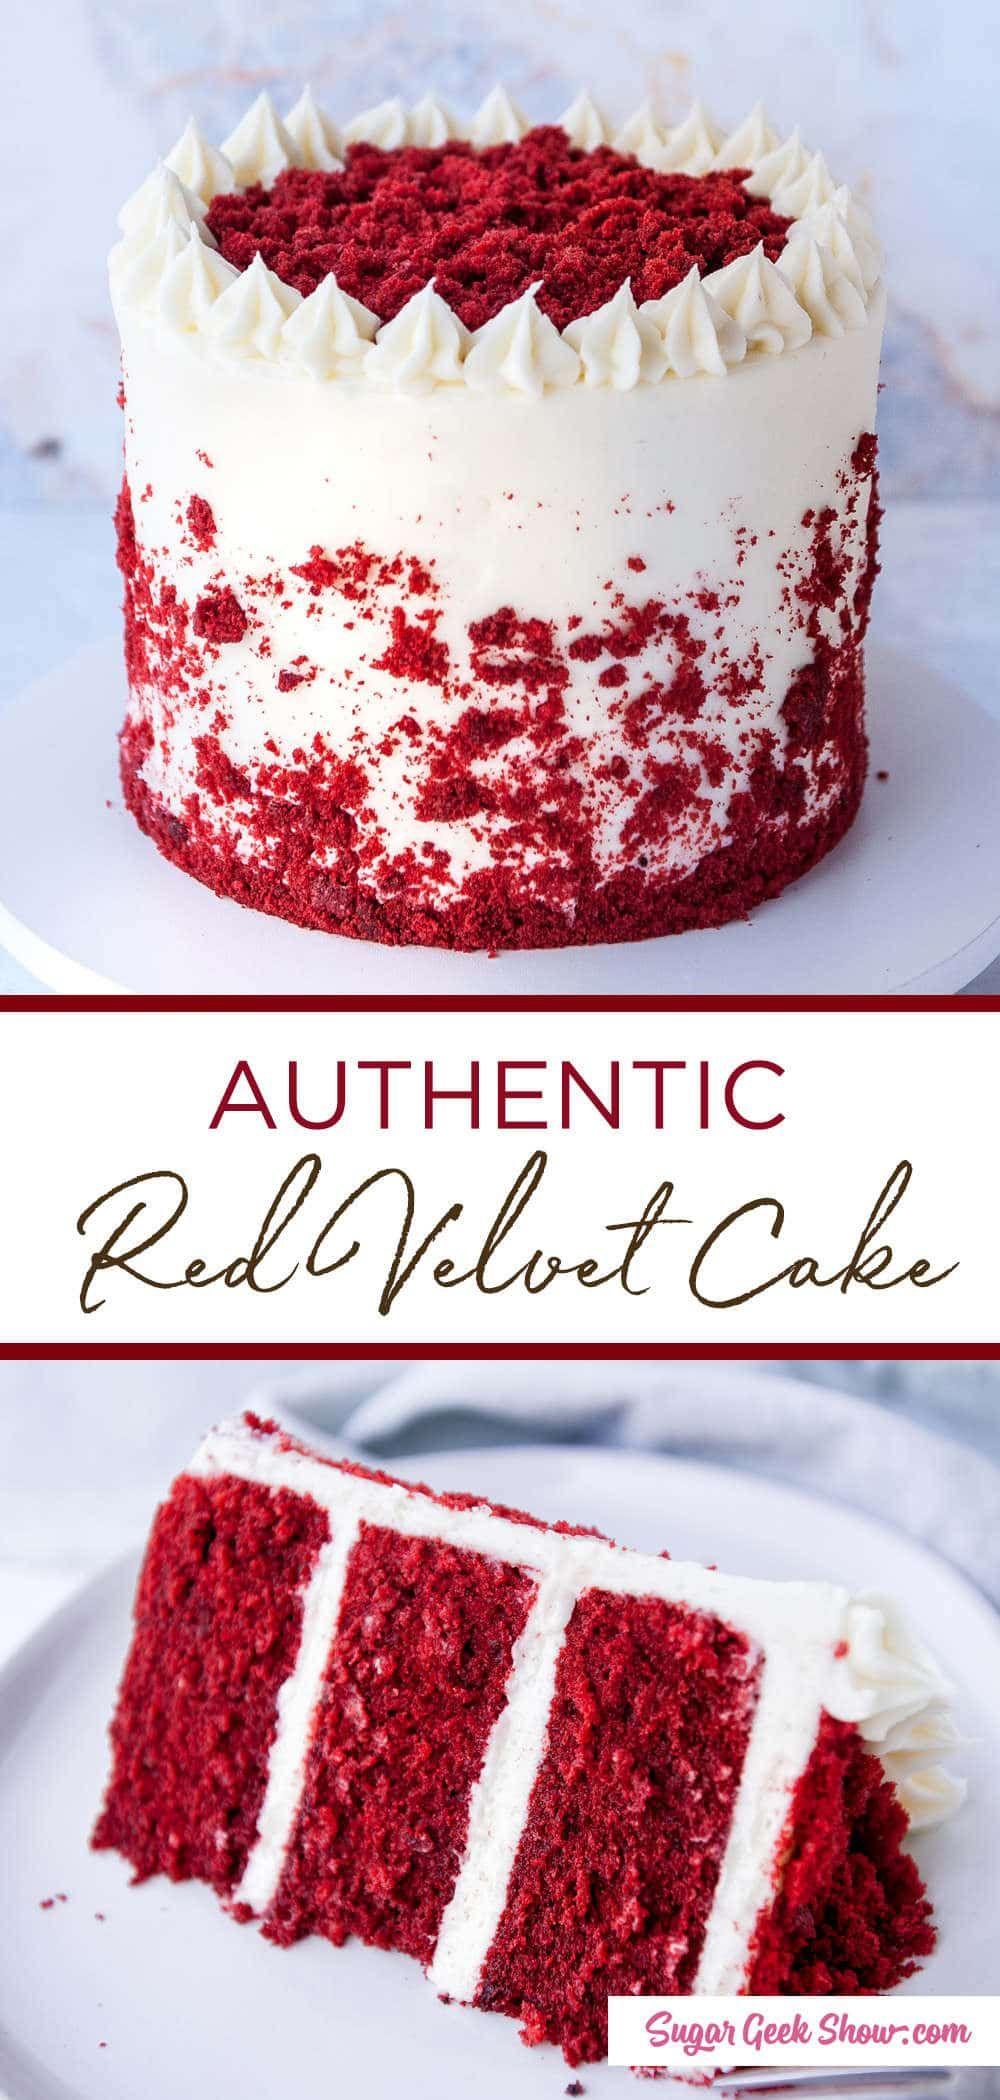 Classic Red Velvet Cake Recipe Cream Cheese Frosting Sugar Geek Show Recipe In 2020 Velvet Cake Recipes Chocolate Cake Recipe Real Red Velvet Cake Recipe